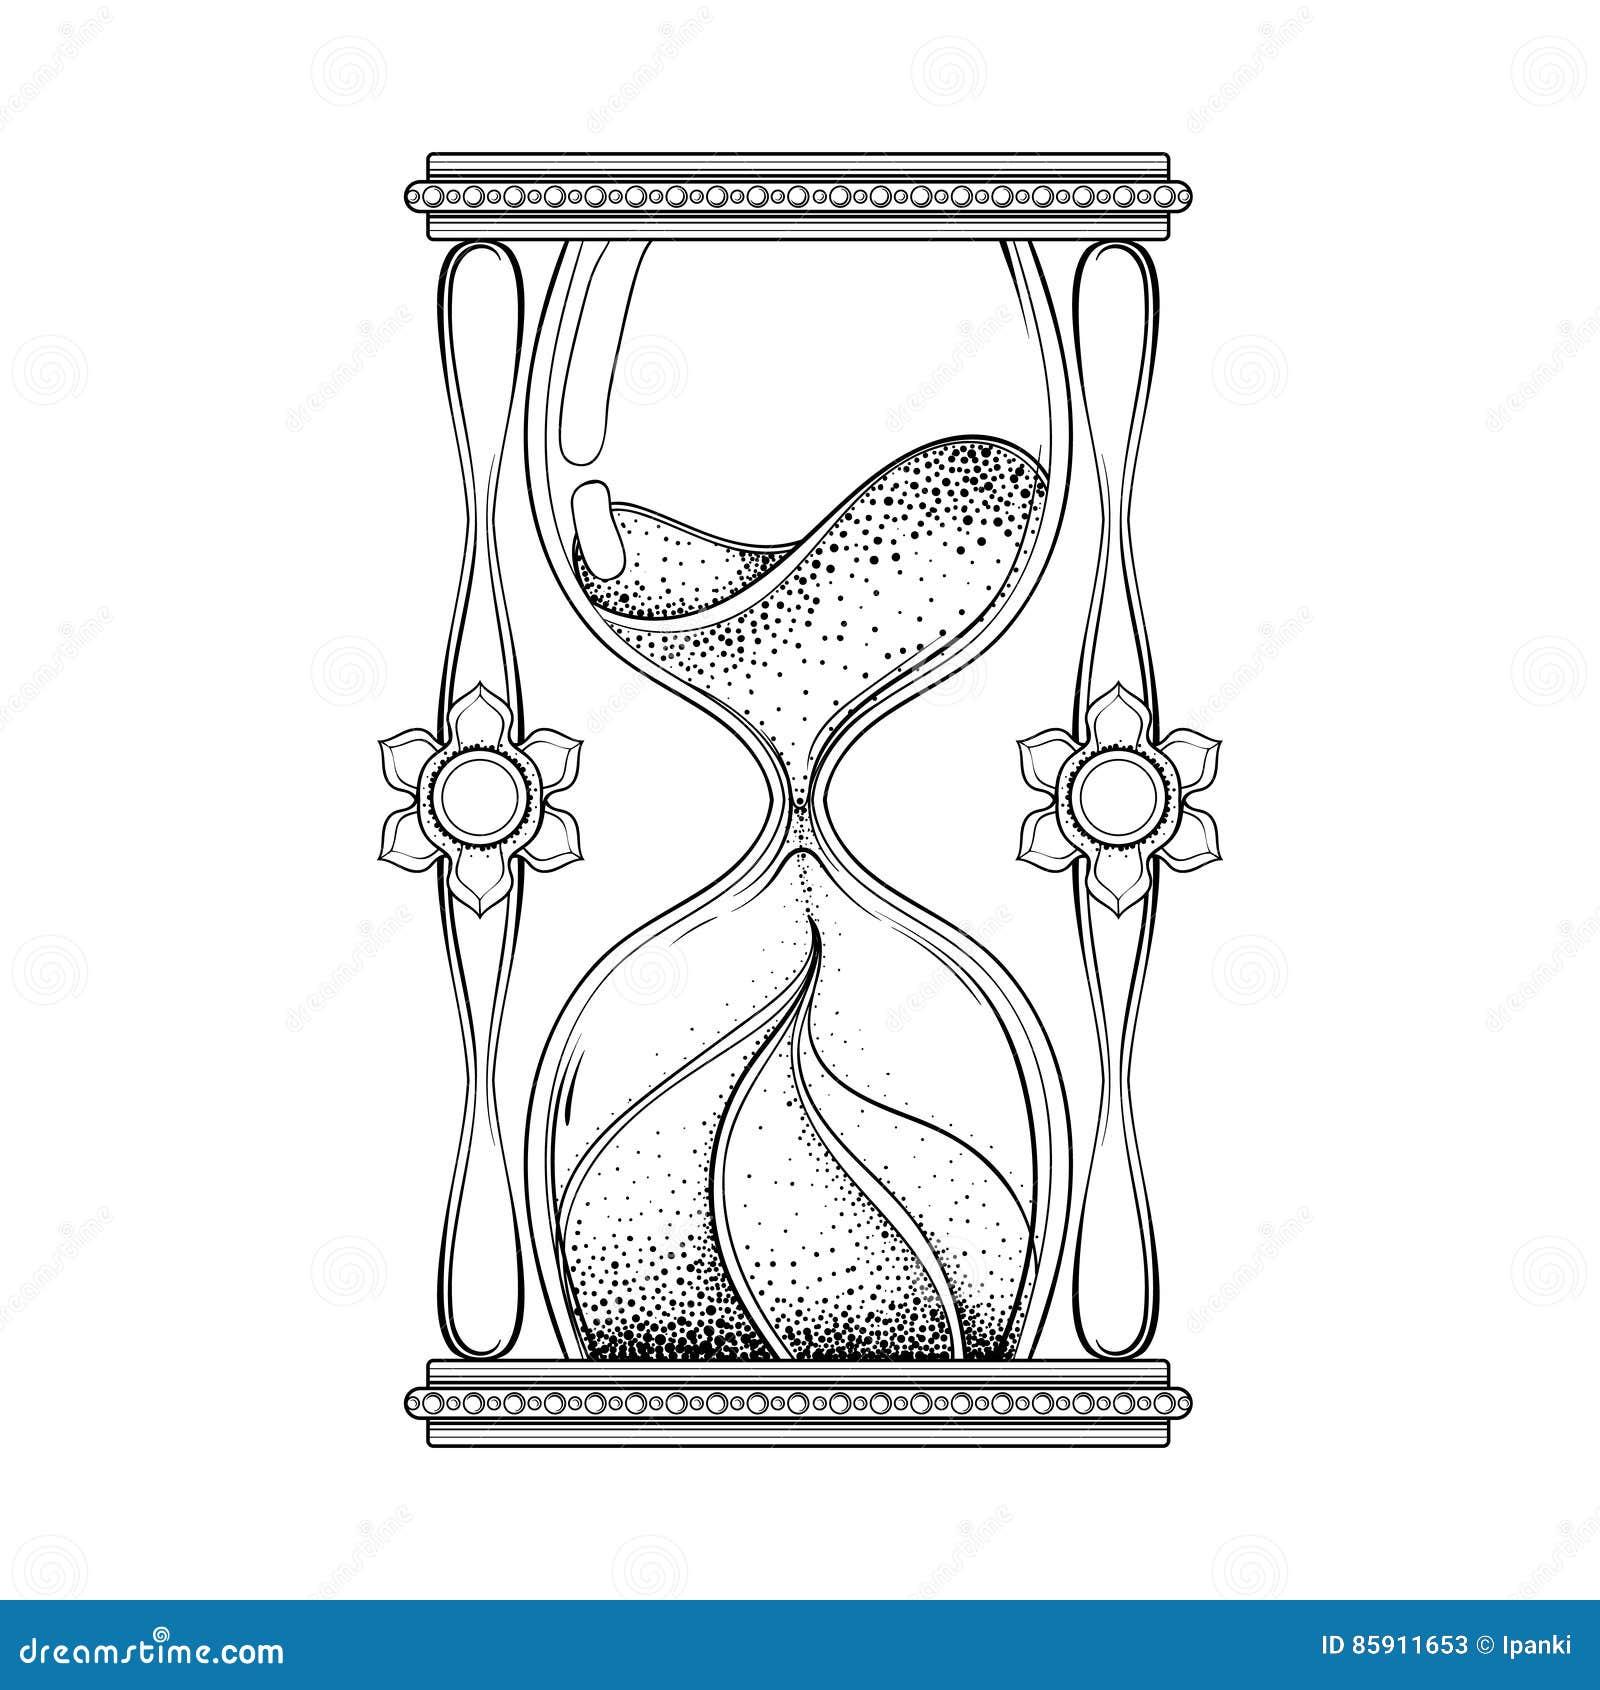 tatouage sablier et horloge